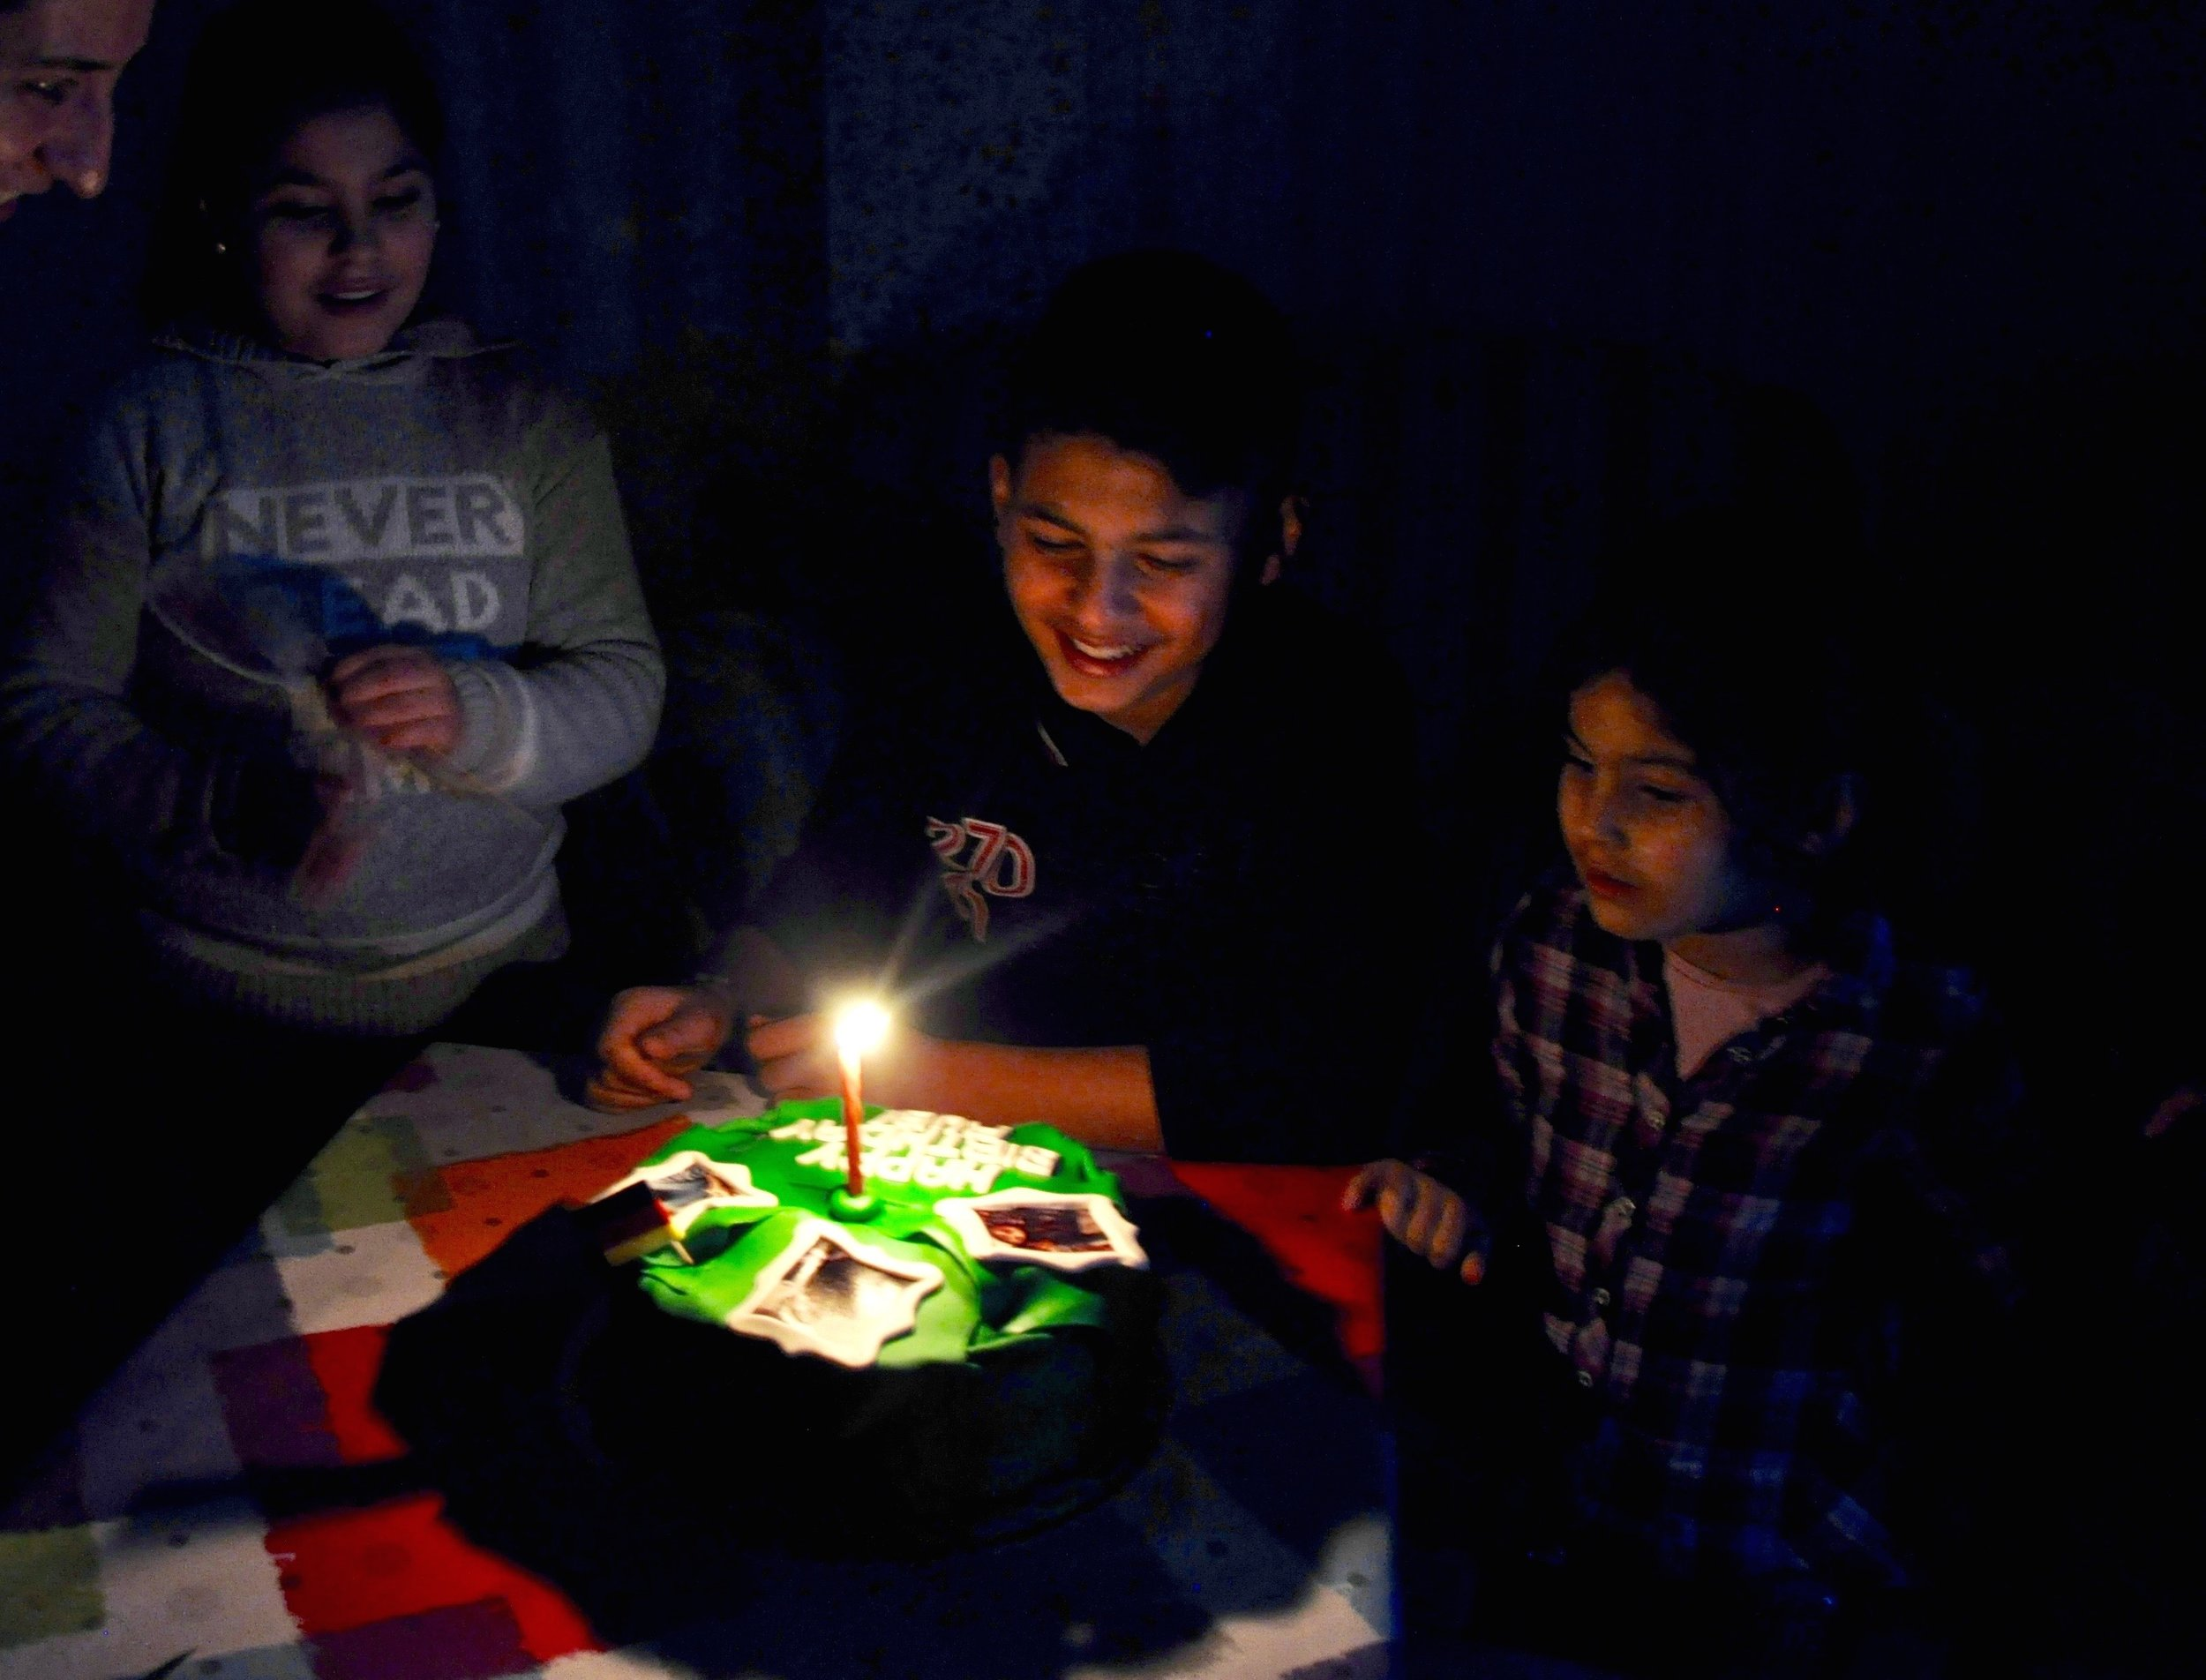 The Sheikho kids celebrate Rubi's 13th birthday. (Photo by Lauren Bohn)